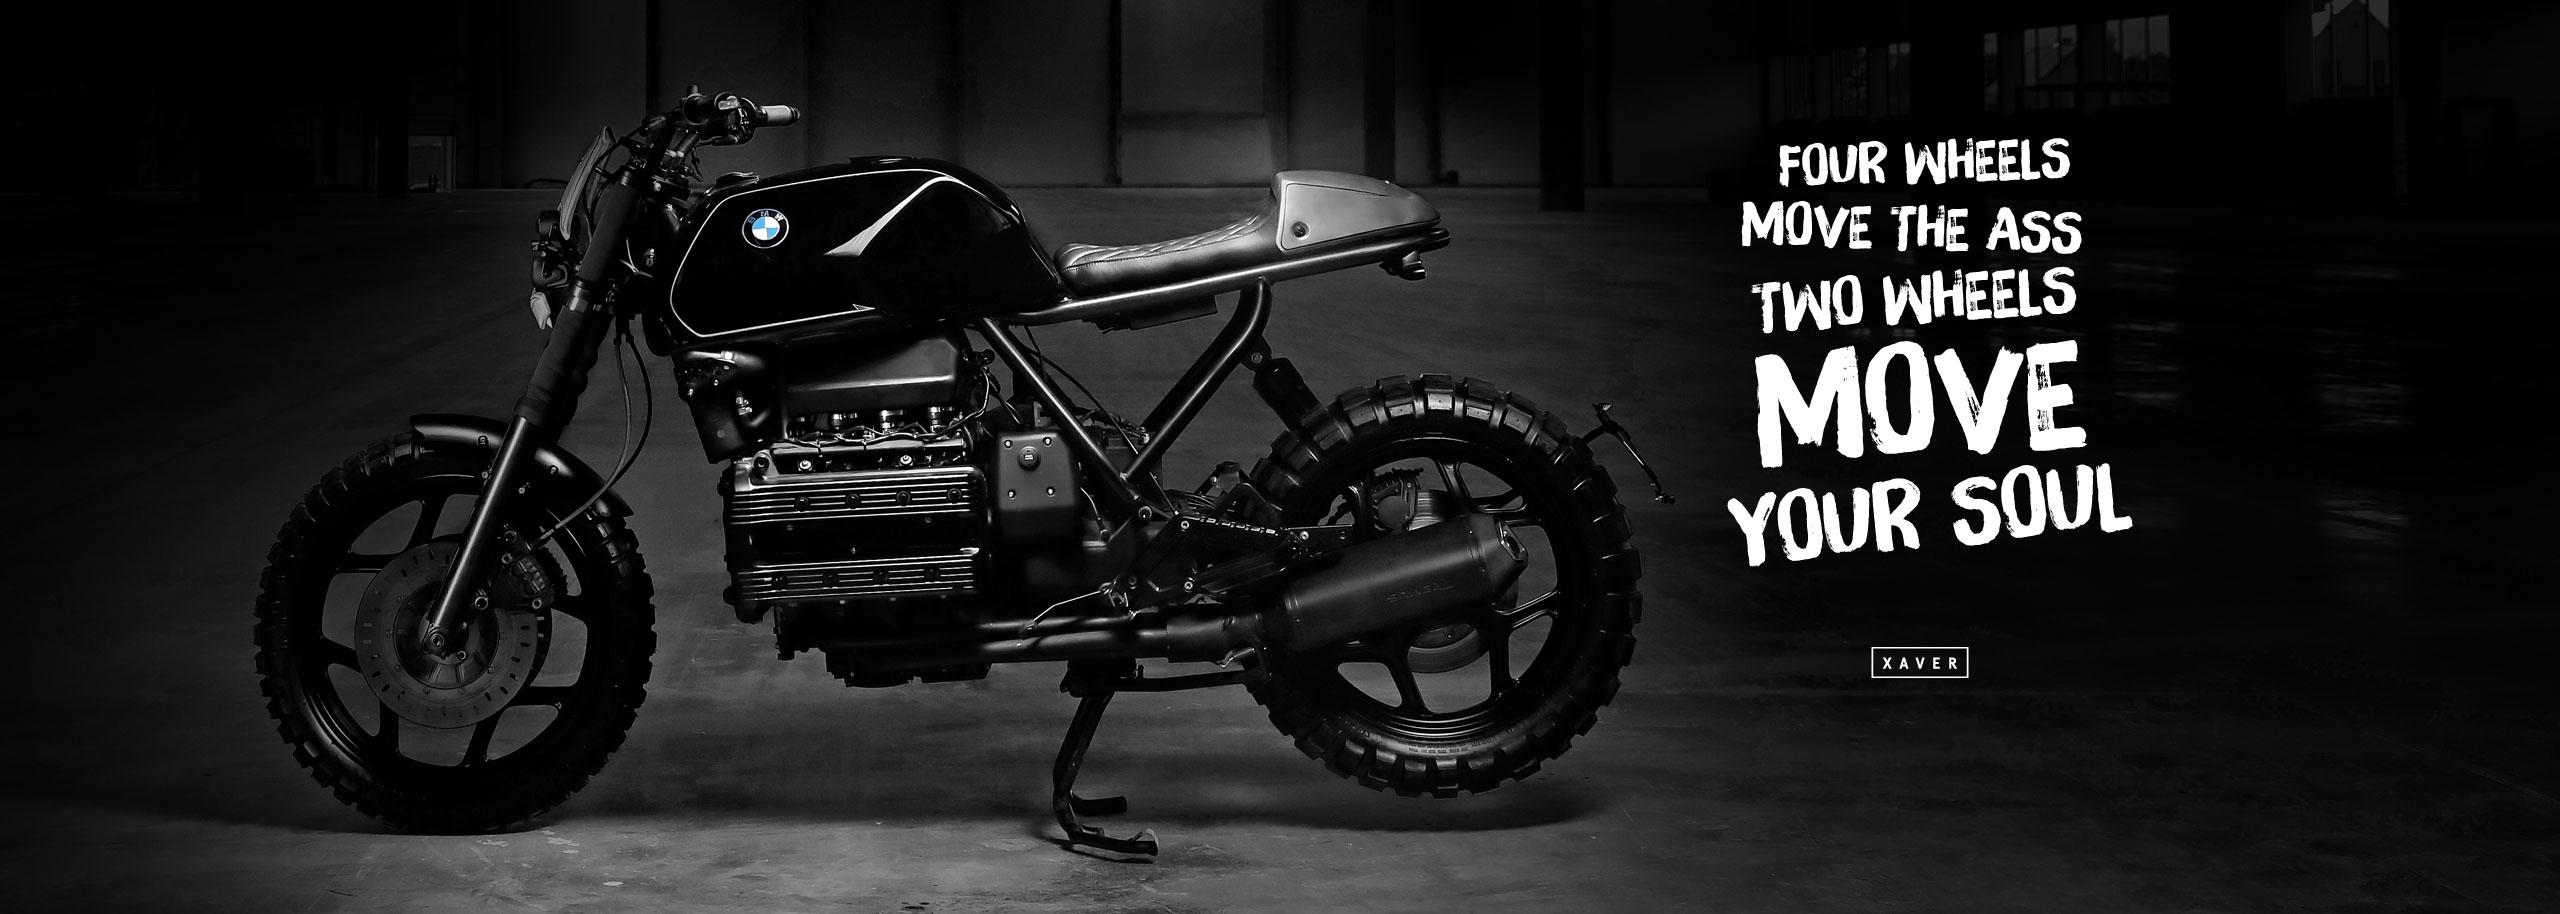 Custom-Bike-Austria-Graz-Cafe-Racer-BMW-K100-Umbau-Motorrad-Typisierung-TITAN-Xaver